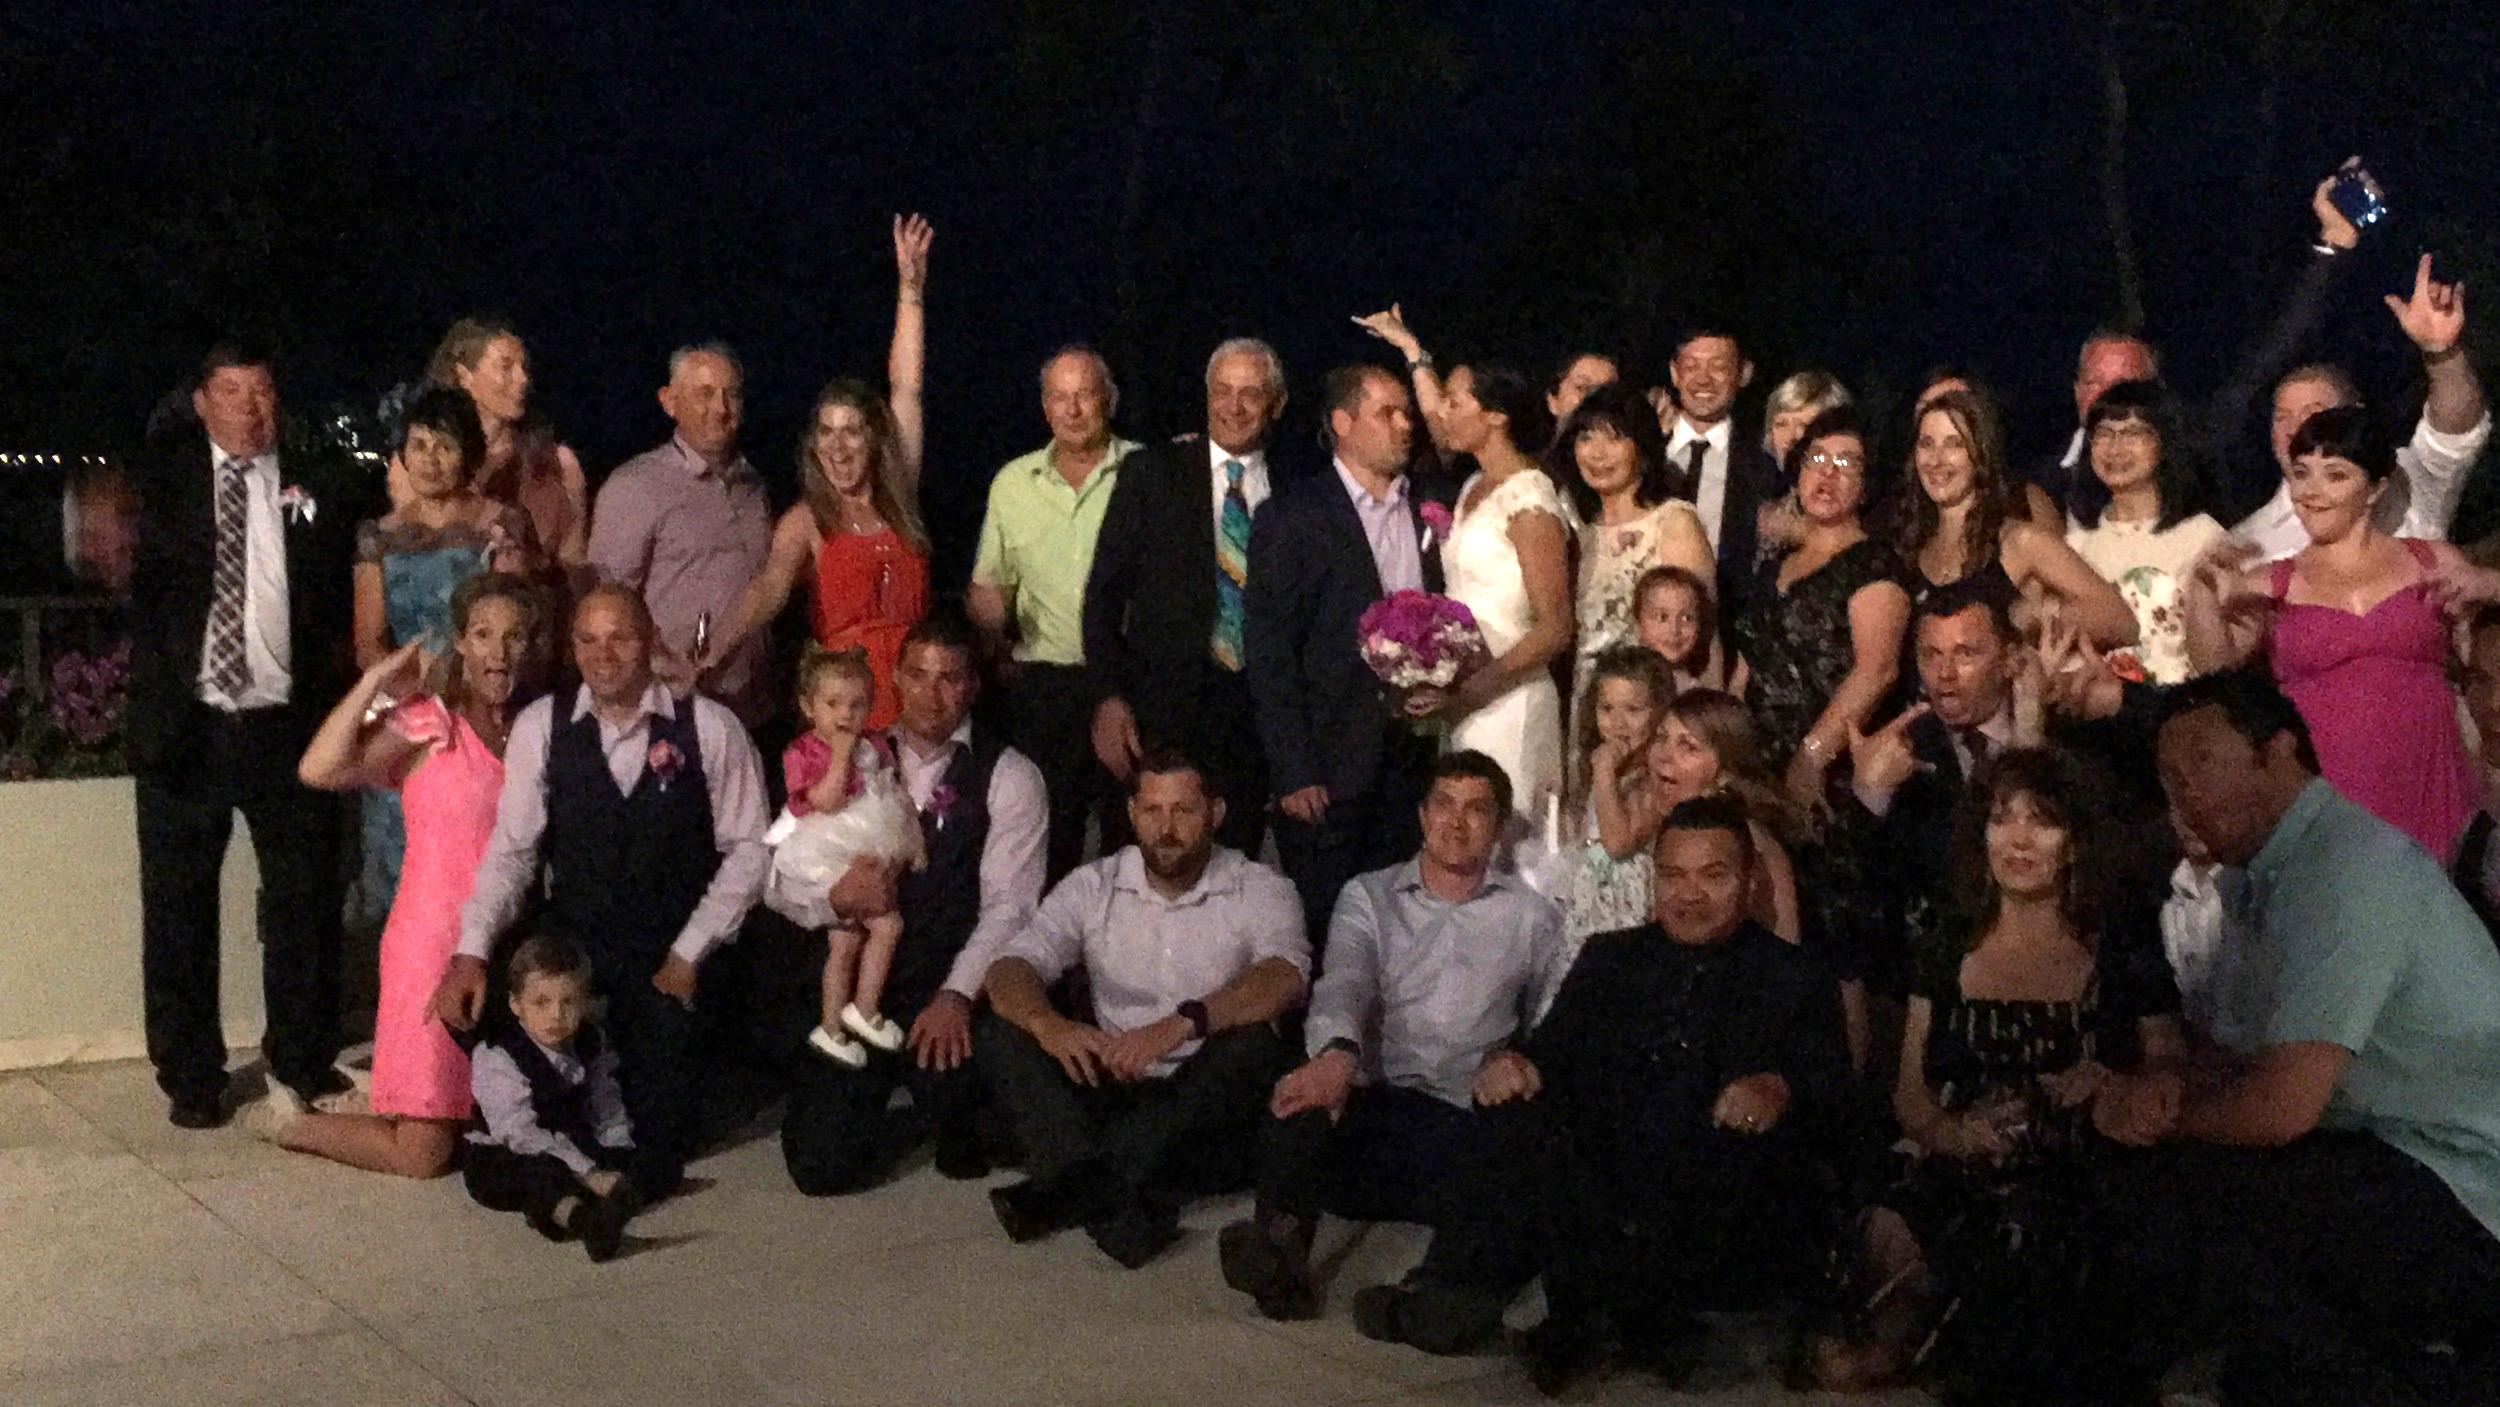 8-halekulani-hau-terrace-wedding-reception.JPG